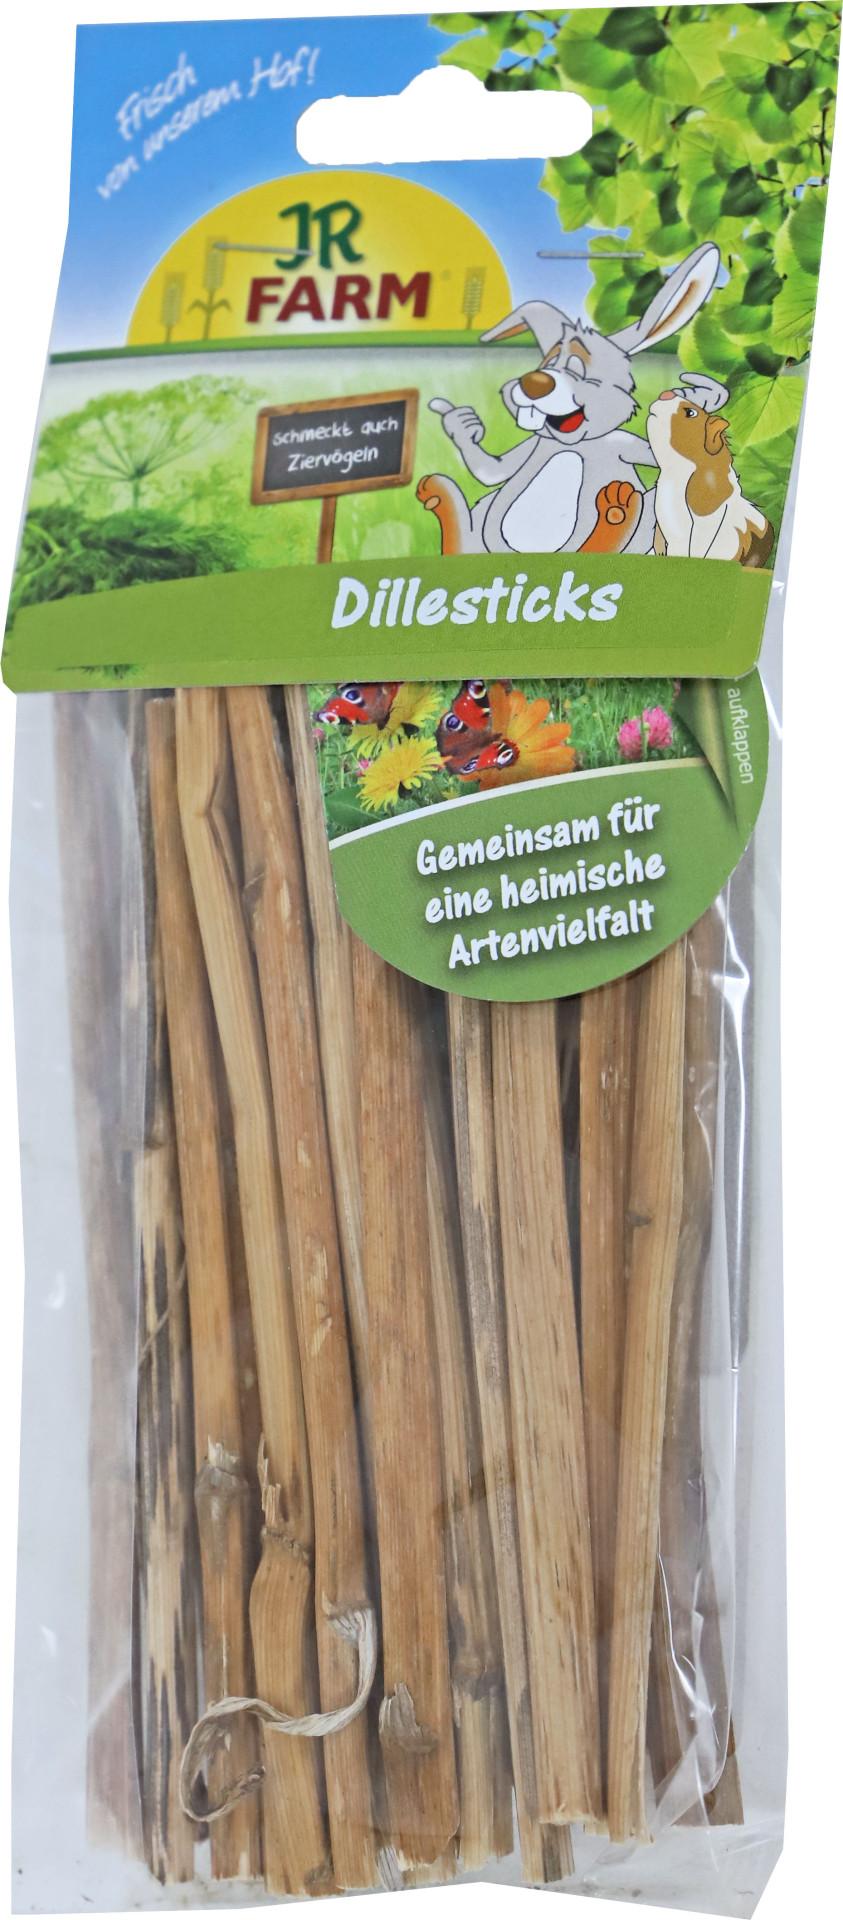 JR Farm dillesticks 15 gr